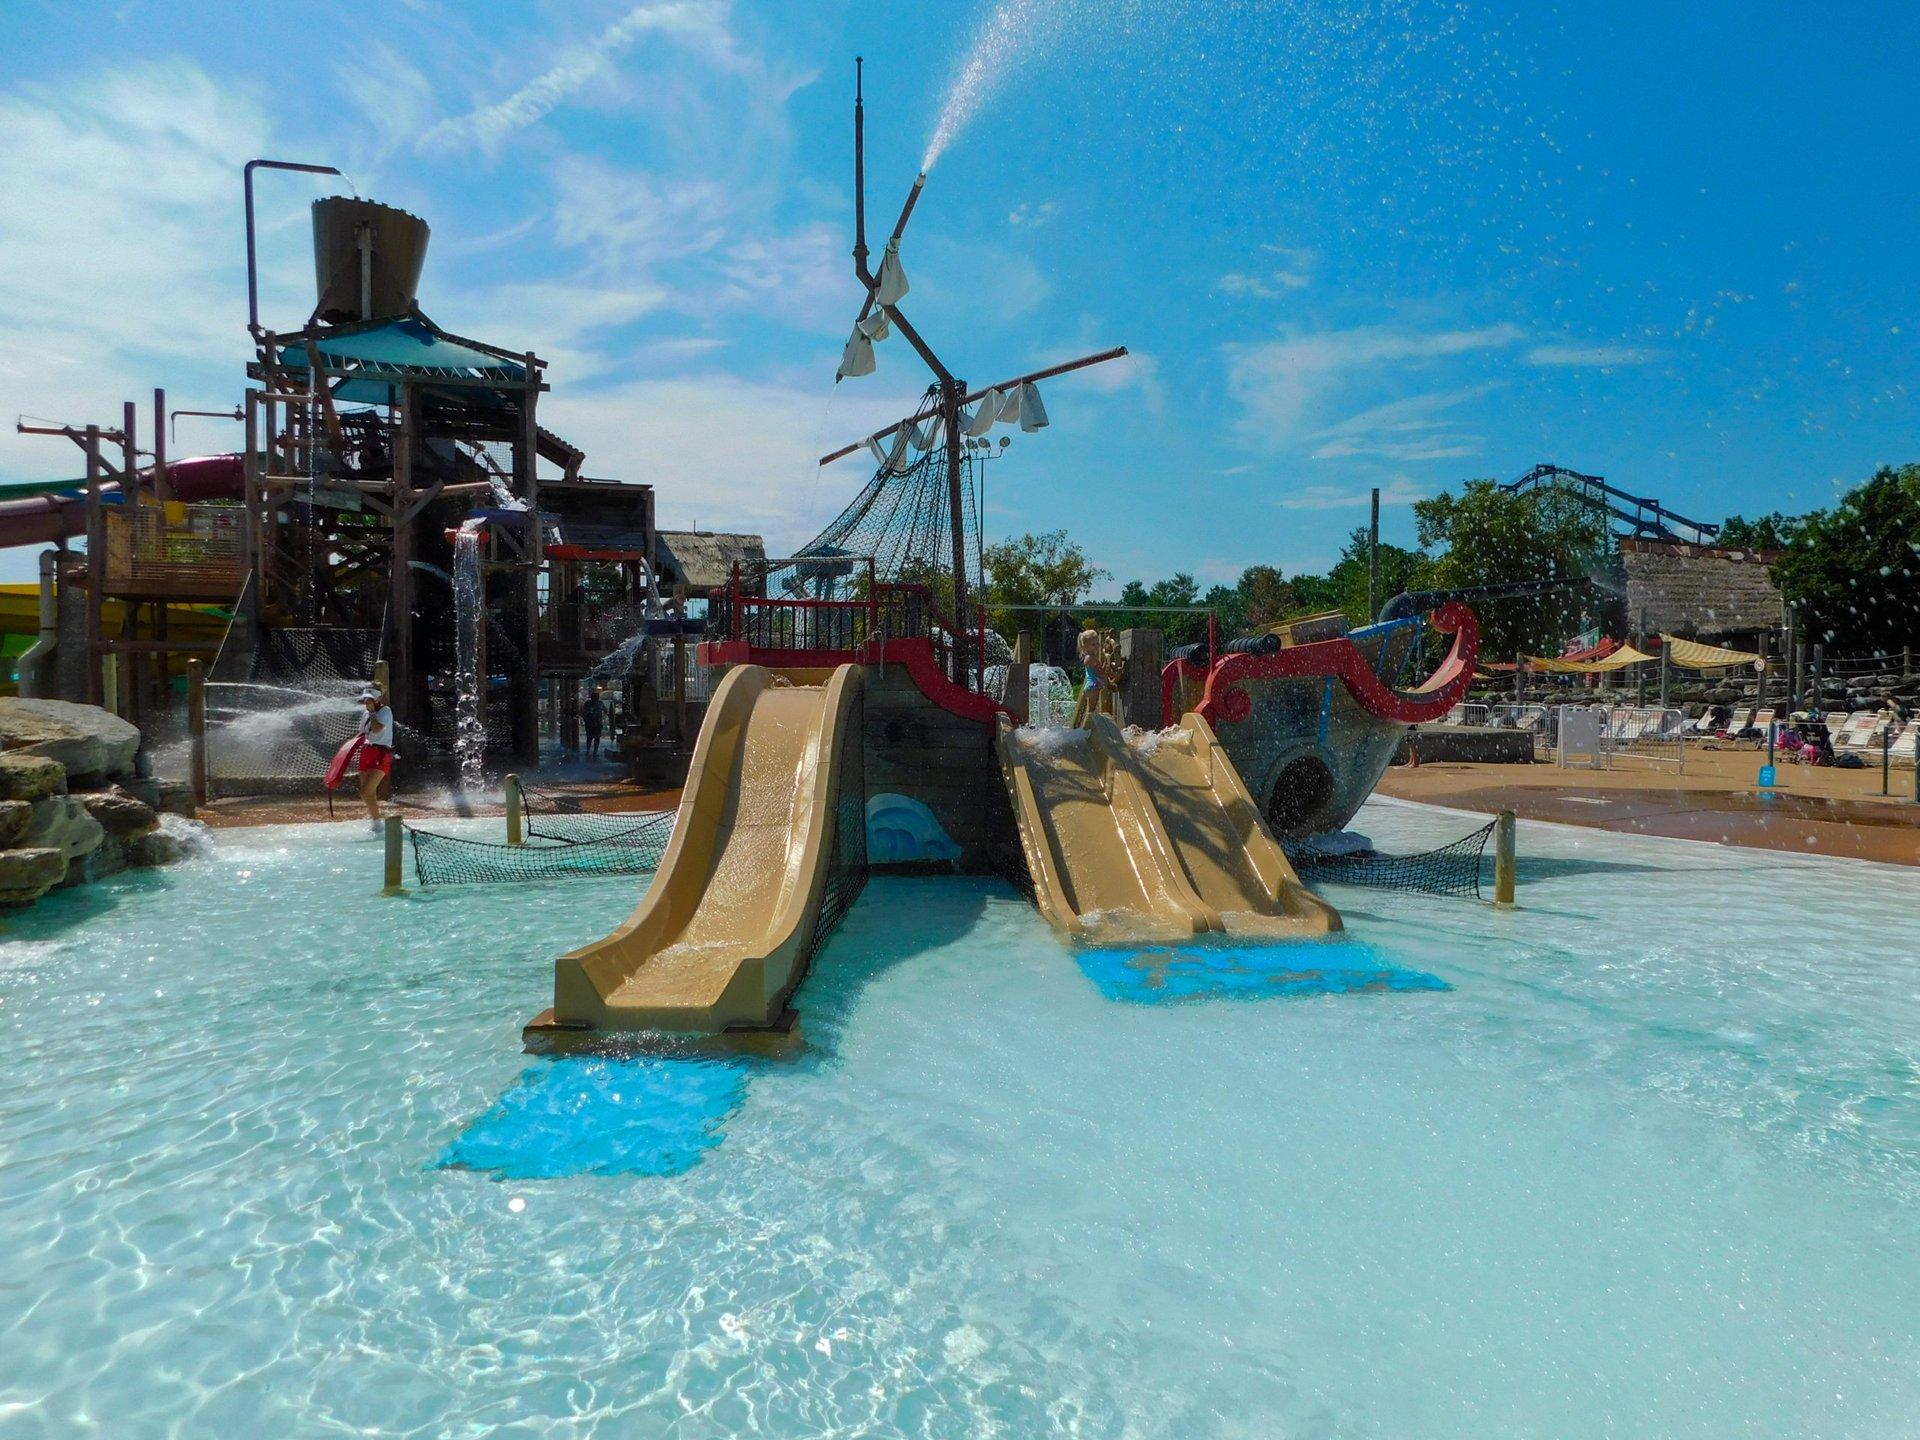 Pirate Ship Slides Six Flags St Louis